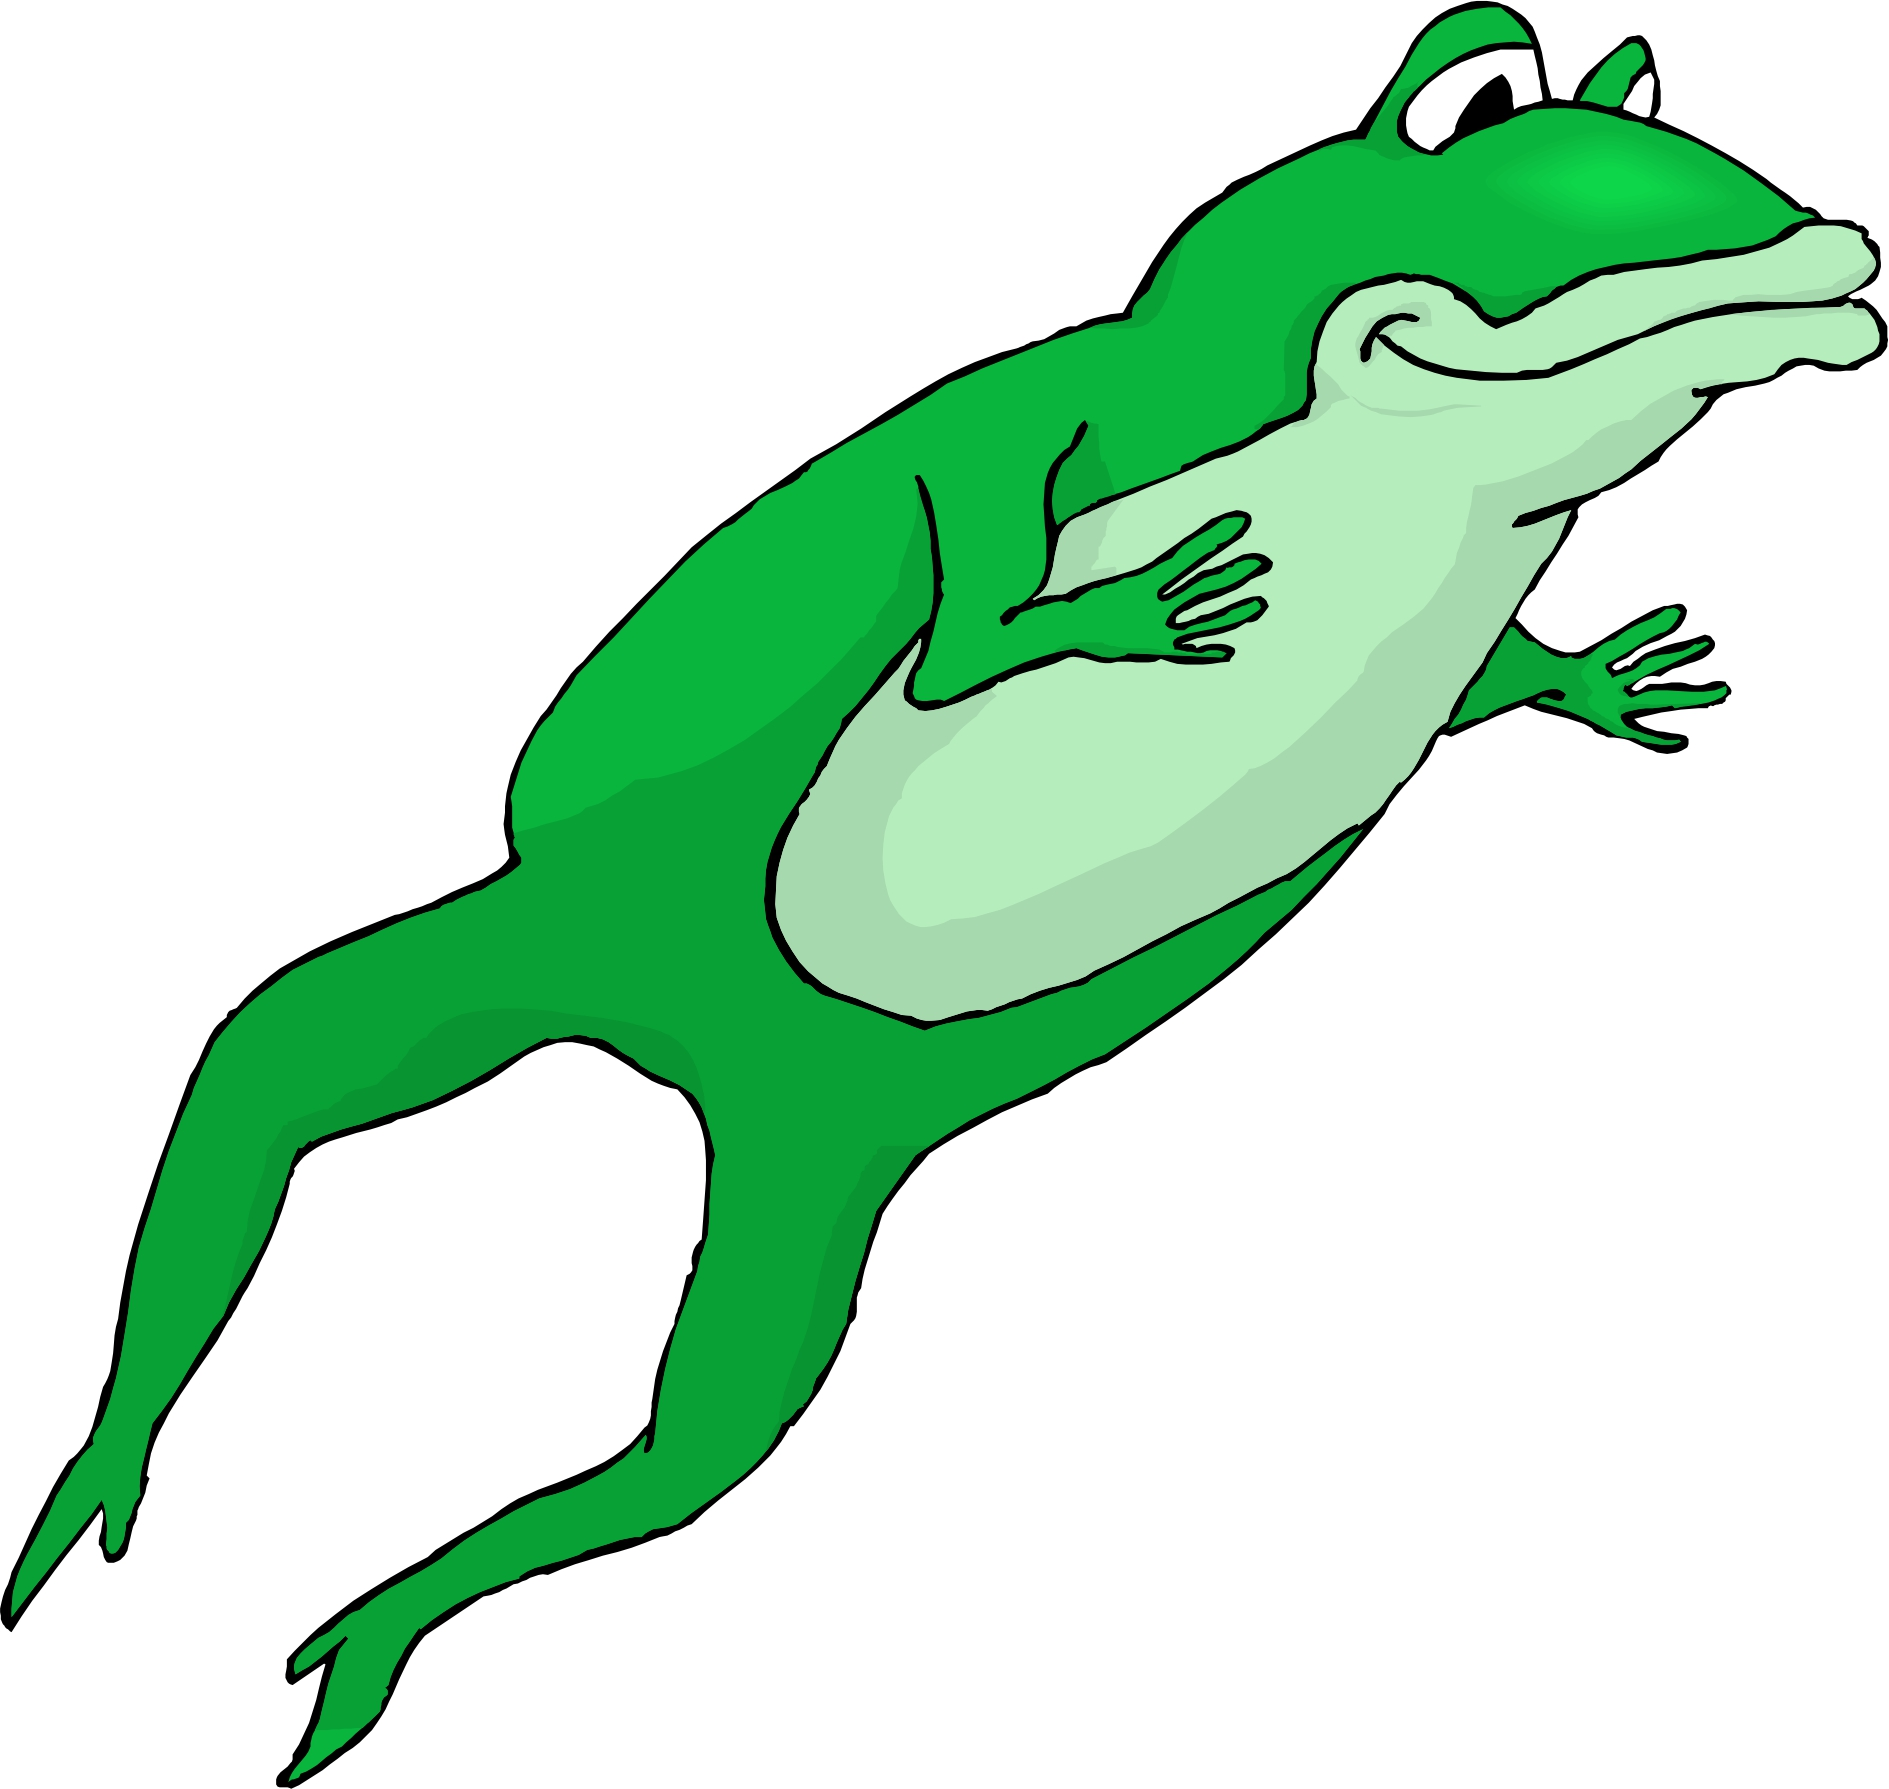 1889x1789 Cartoon Jumping Frog Clipart Panda Free Clipart Images J7tmgp